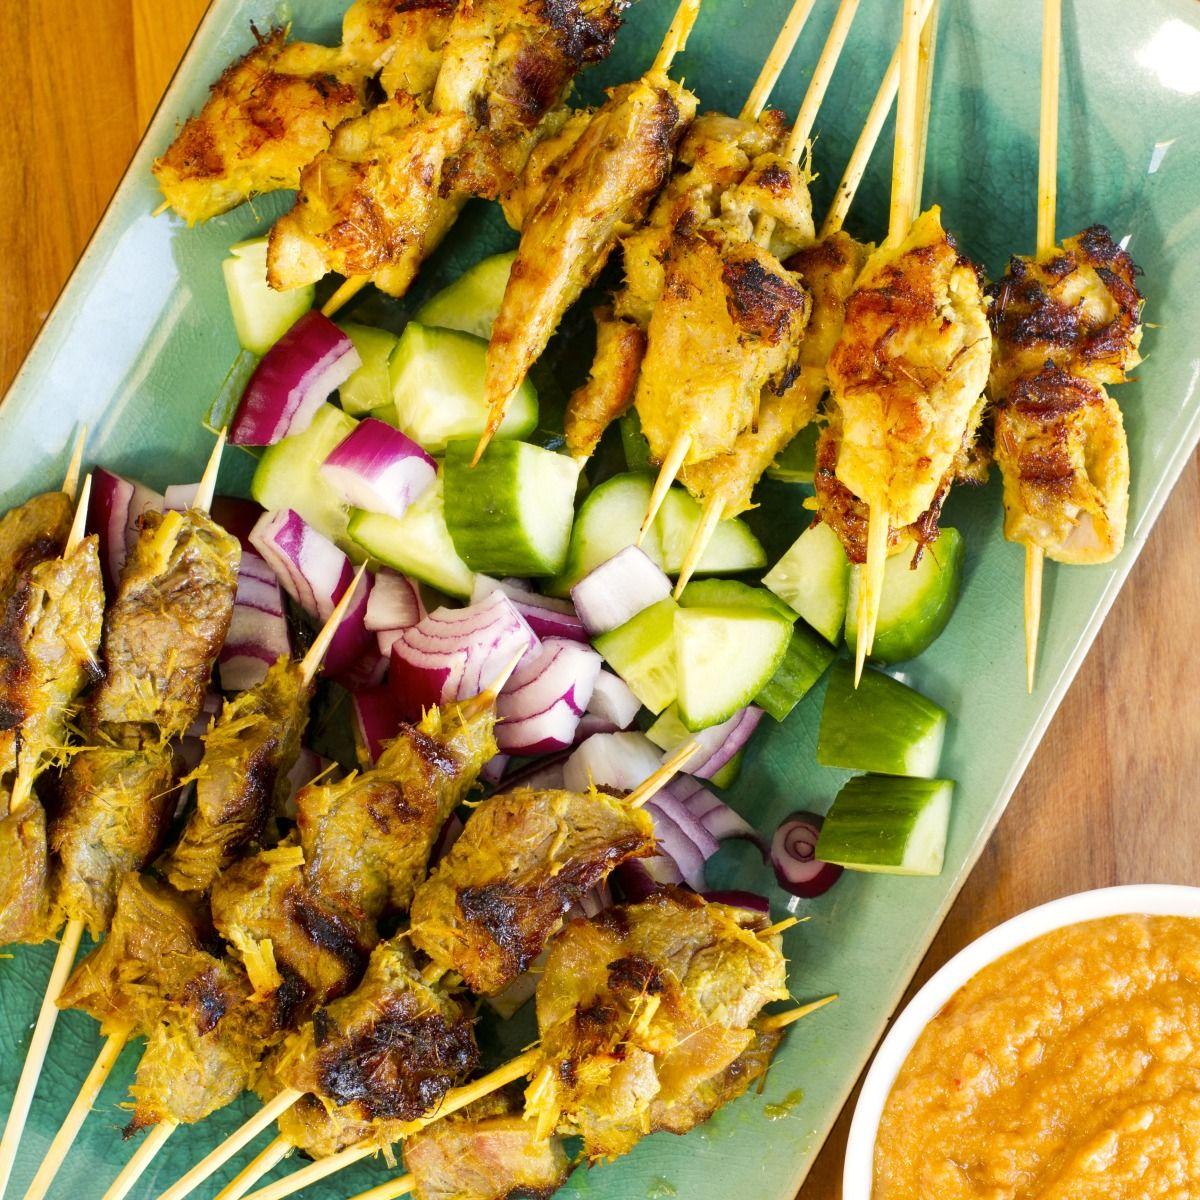 Beef And Chicken Satay With Peanut Sauce Recipe Nadia Lim